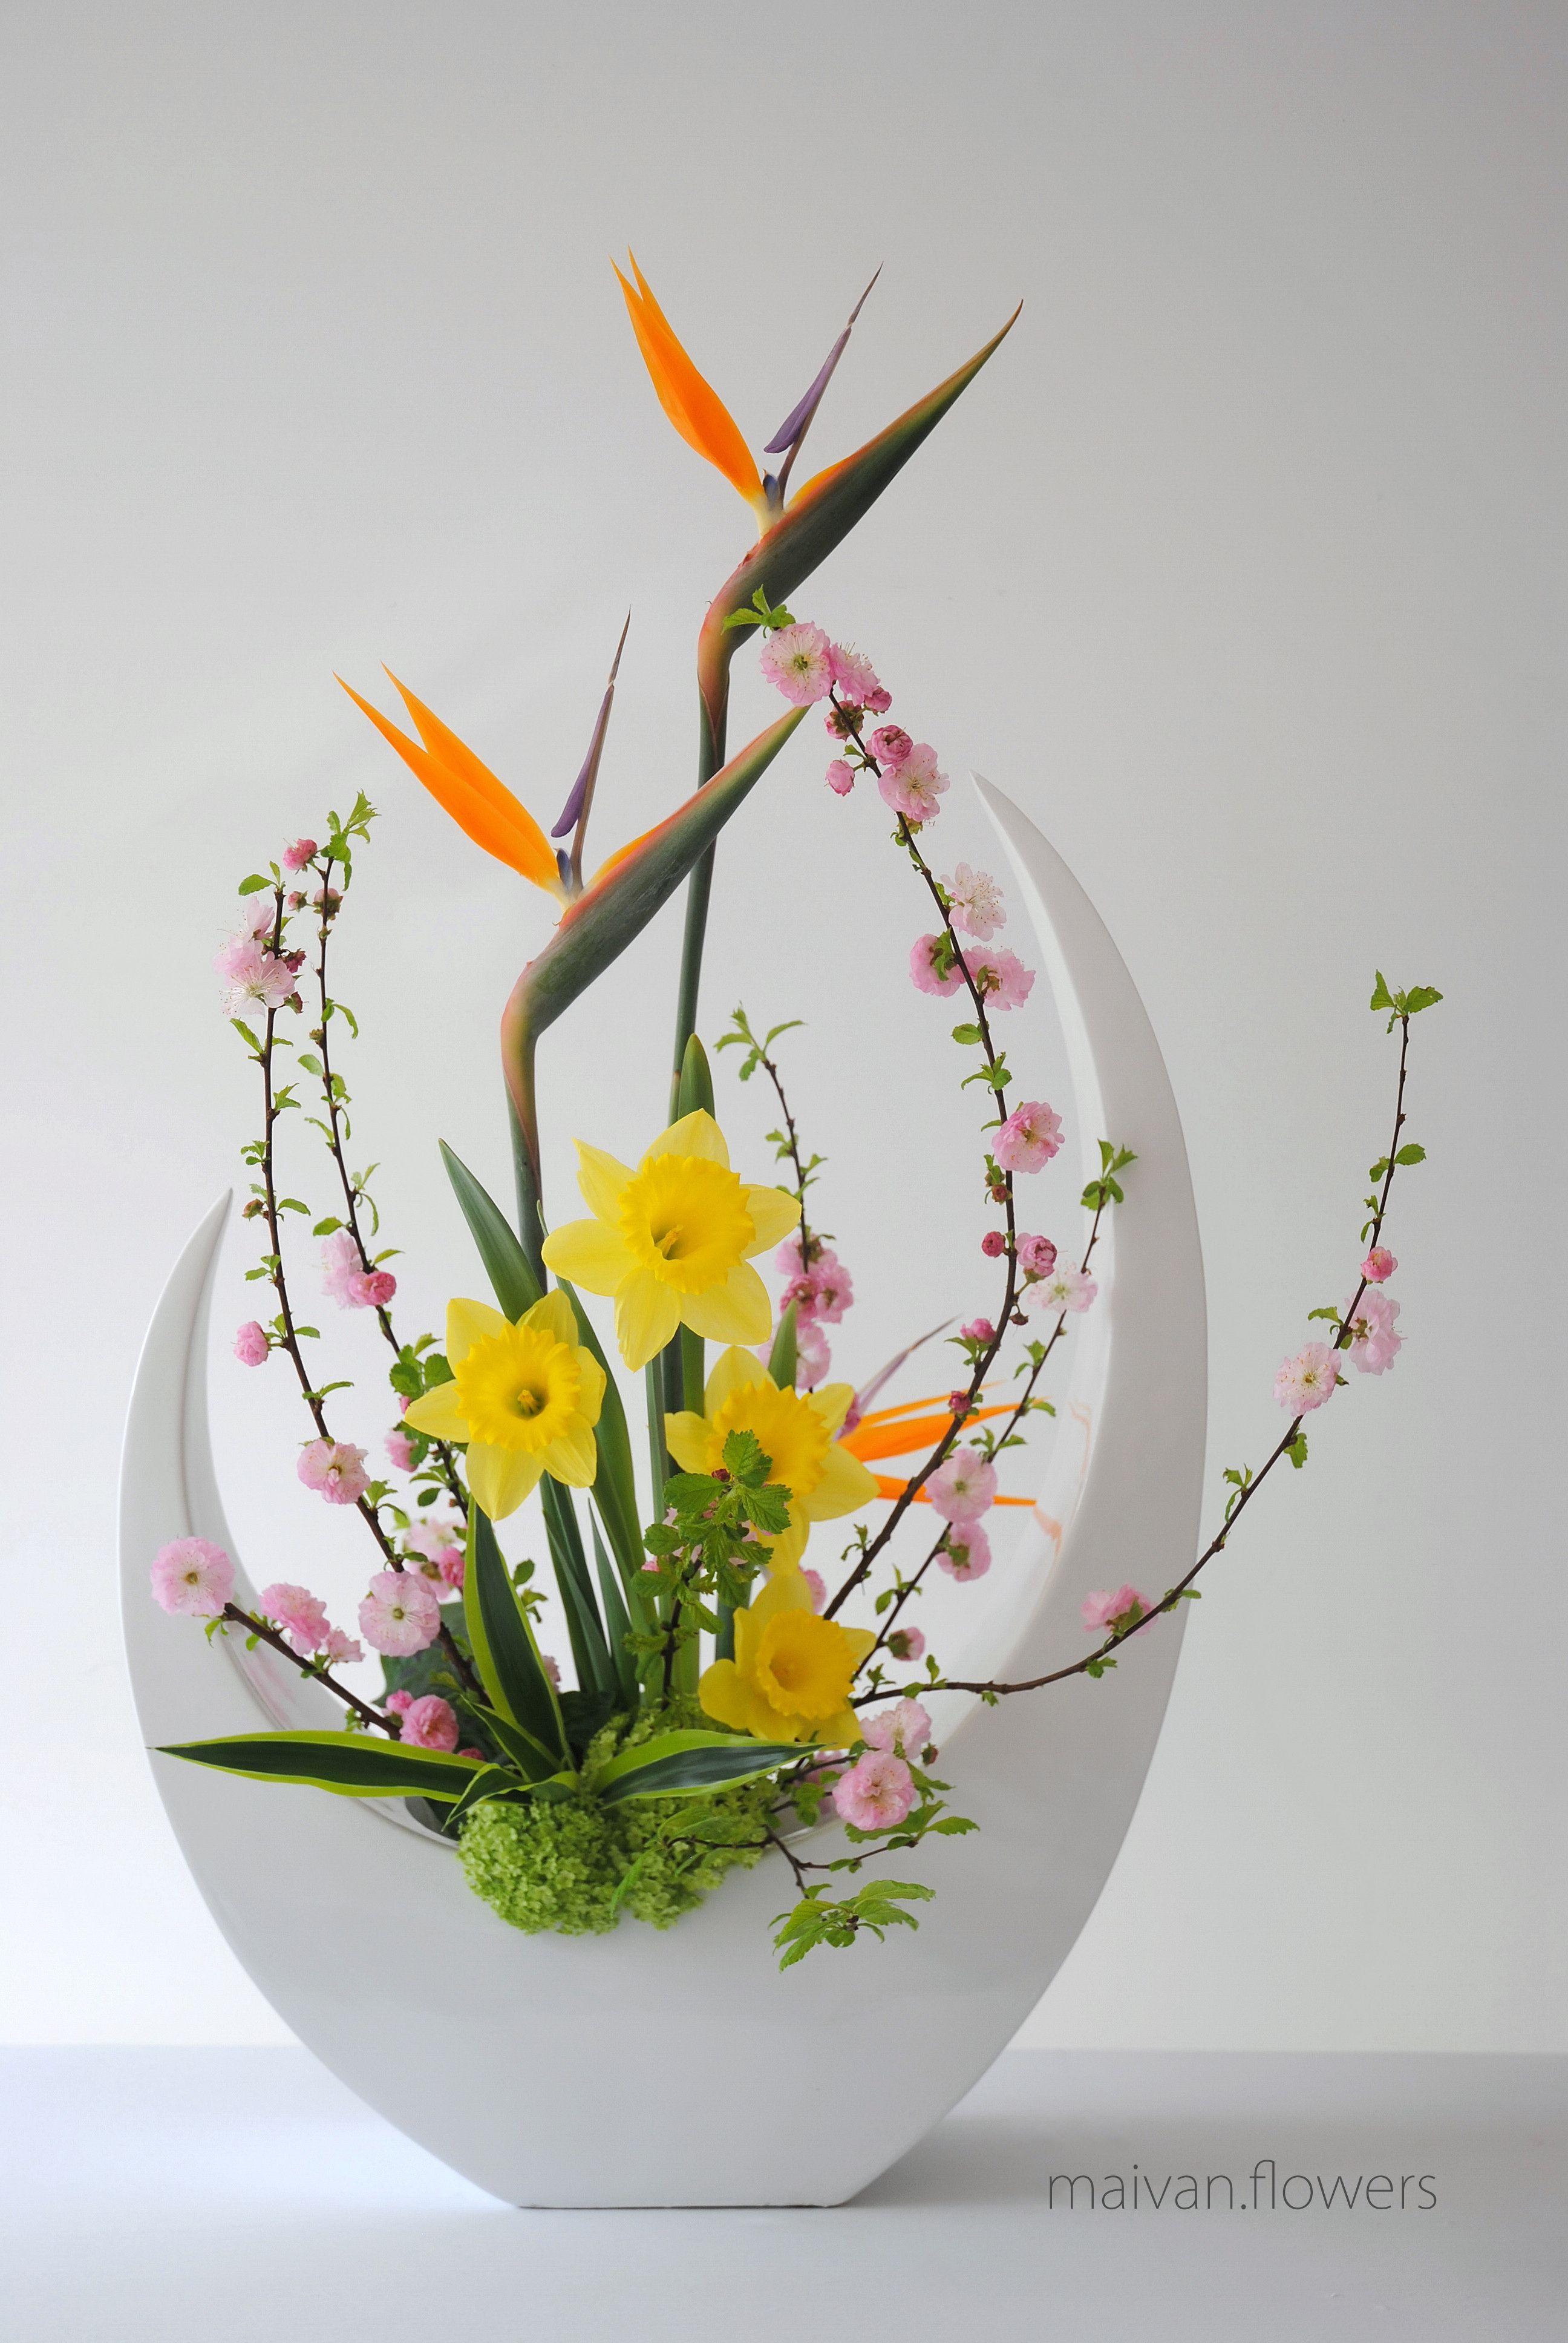 4 saisons – 4 seasons ikebana – maivan.flowers